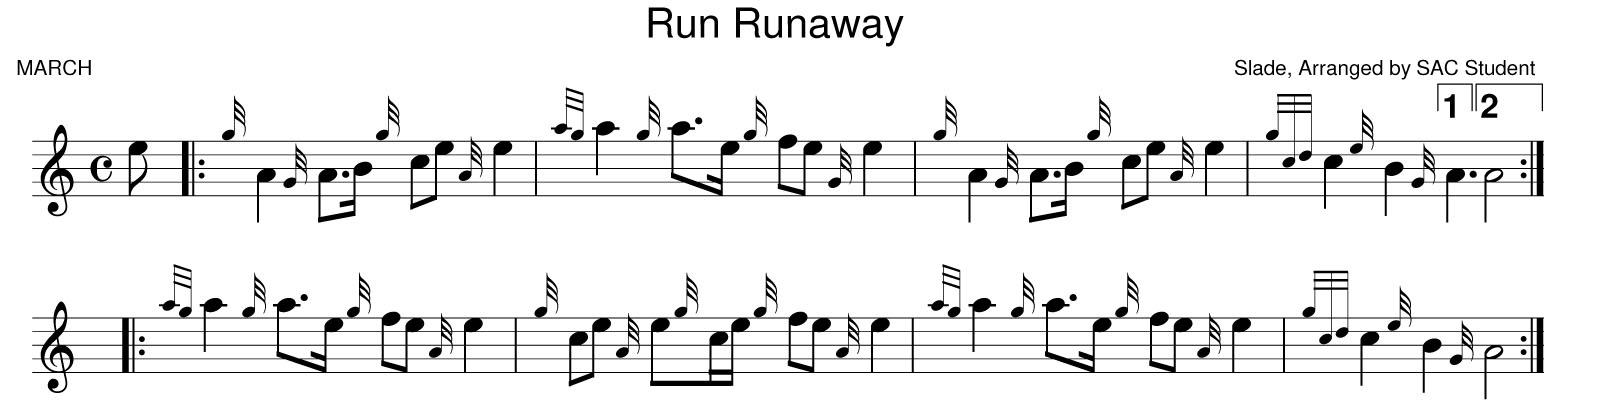 All Music Chords runaway sheet music : Bagpipe Music | PCS Pipe Band